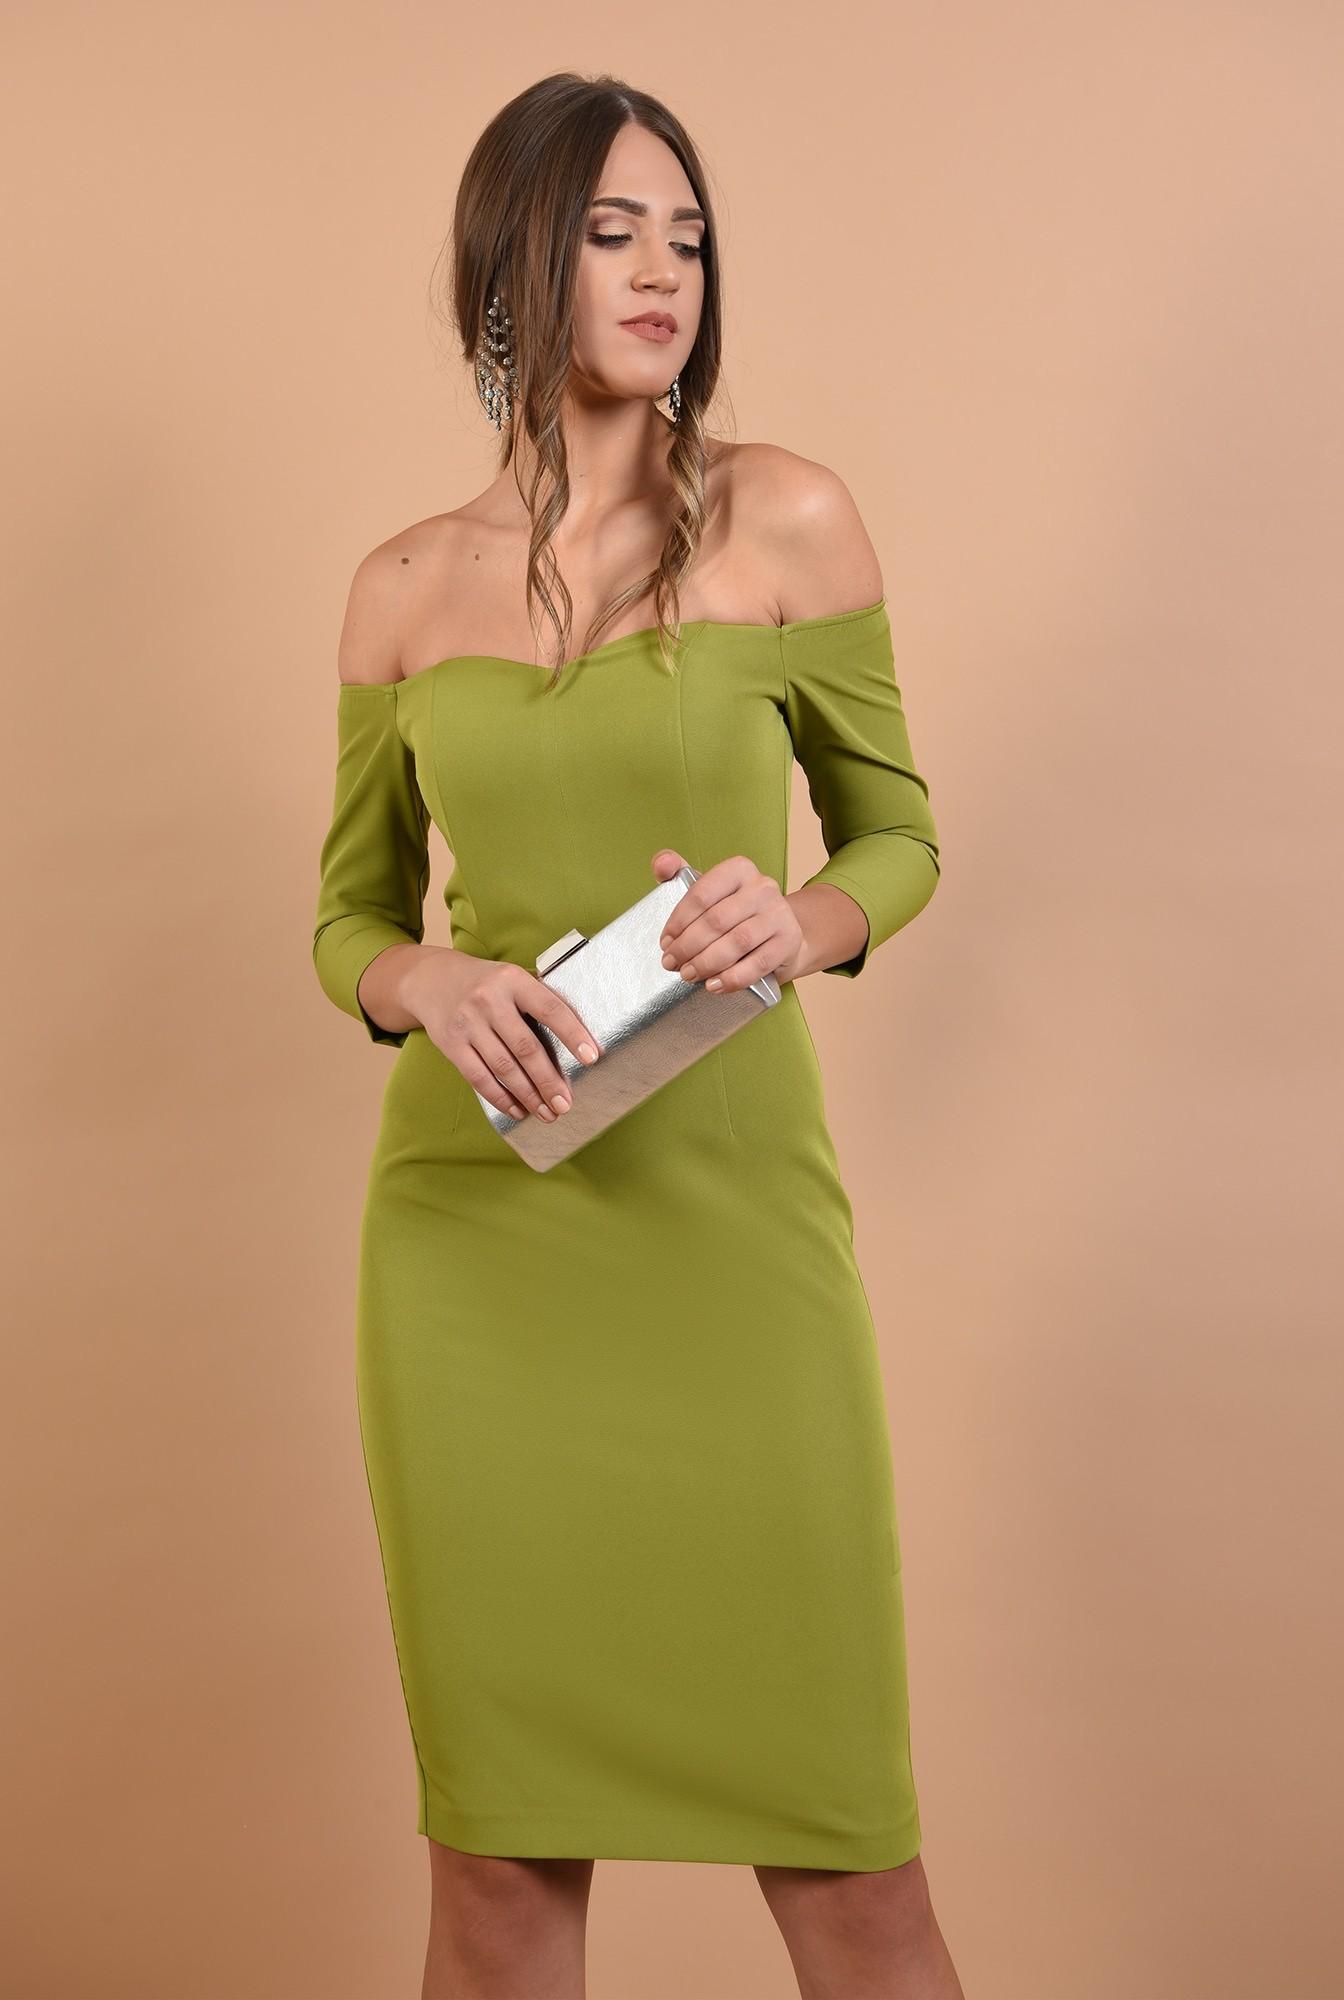 0 - rochie Poema, eleganta, cambrata, cu maneci ajustate, verde lime